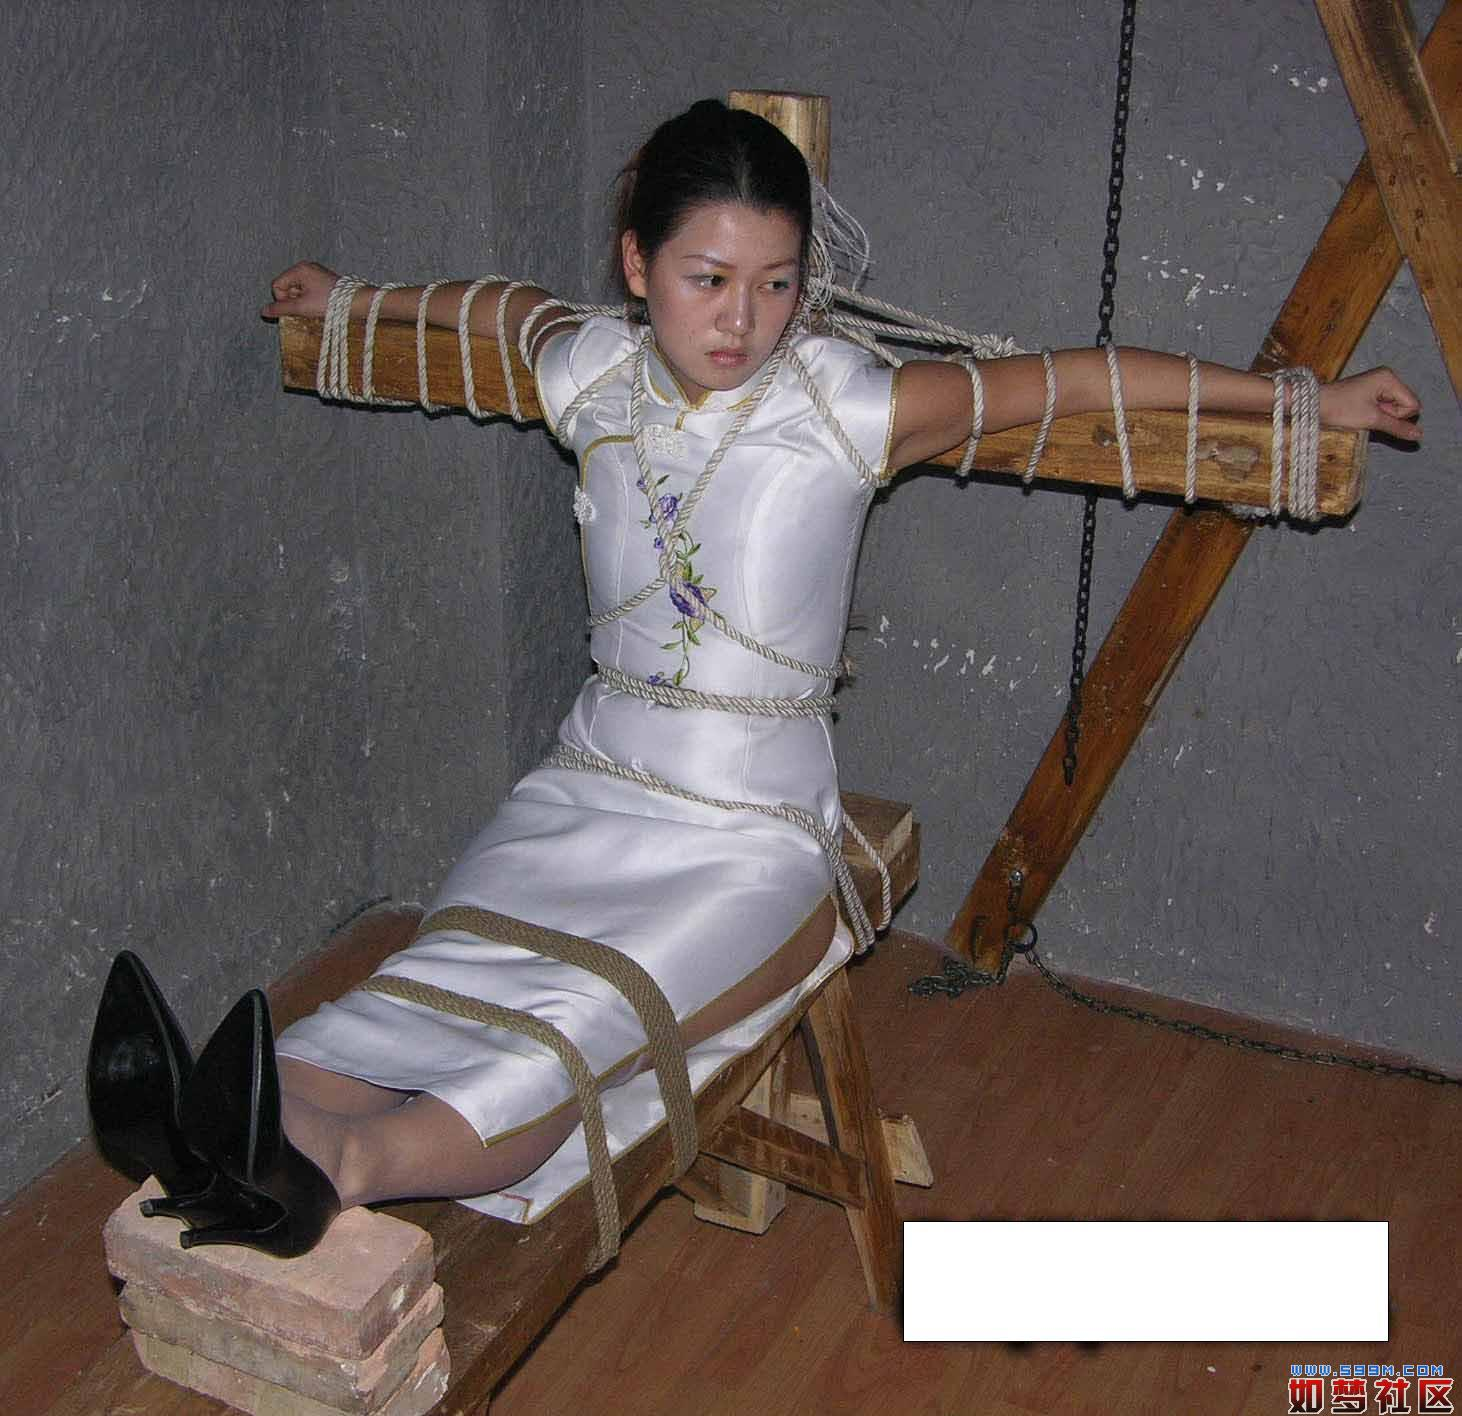 Girls tied spread-eagle on beach bondage punished executed xxx